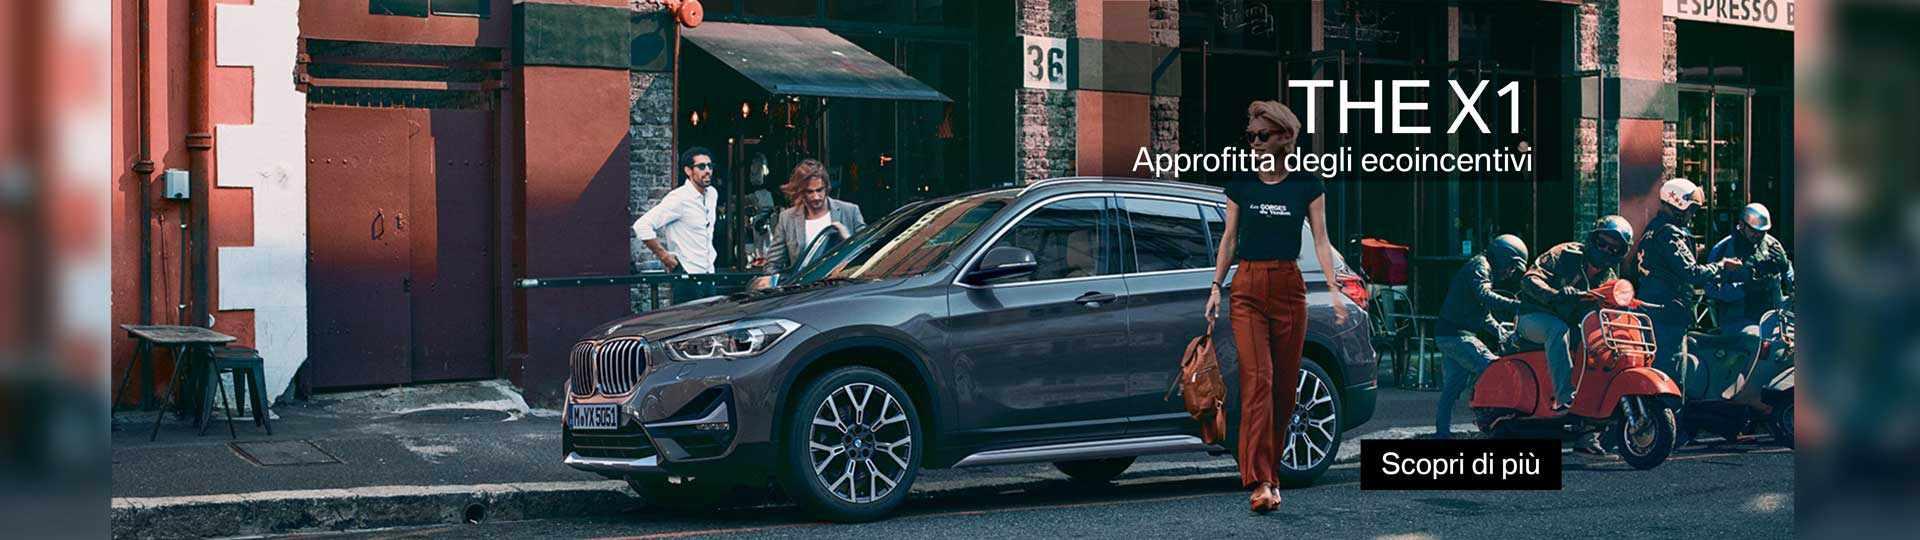 BMW-X1-min.jpg